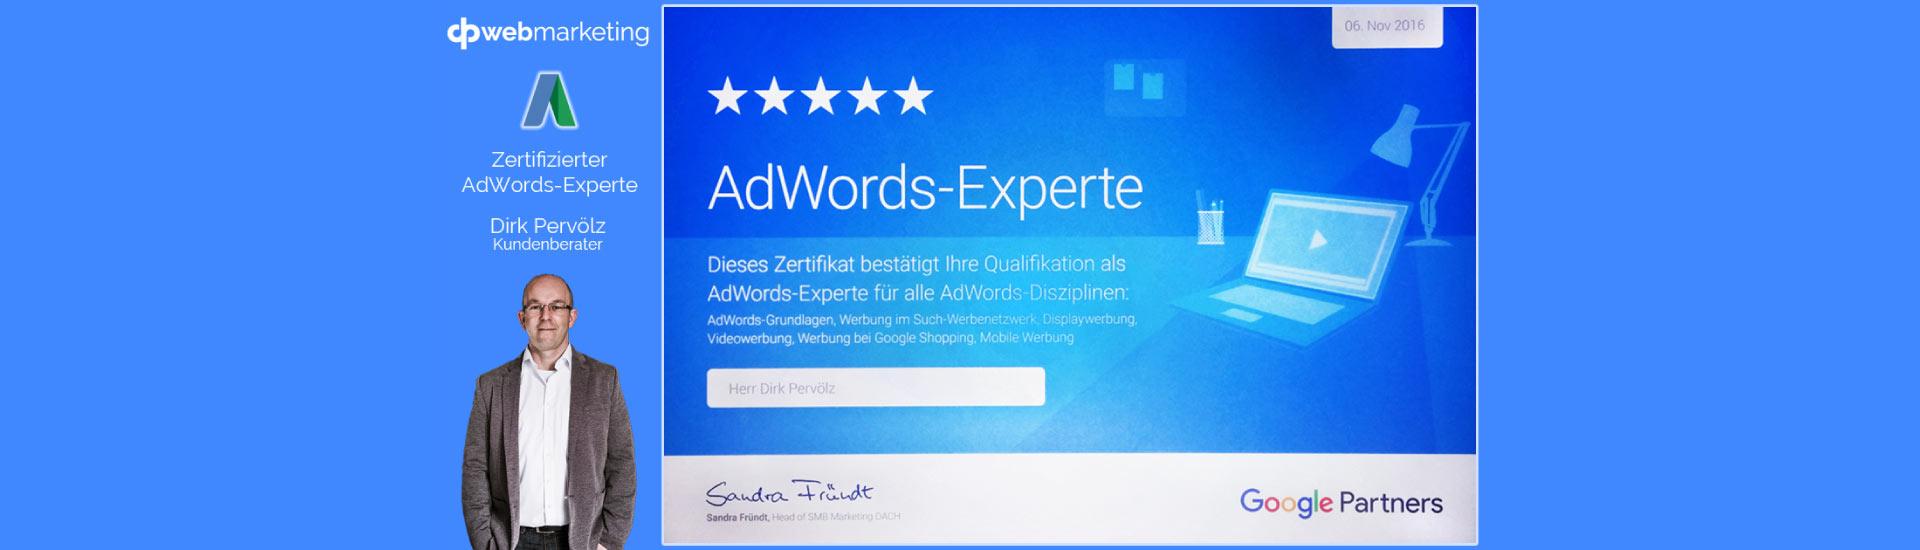 AdWords Experte Dirk Pervölz - Beitragsbild Banner